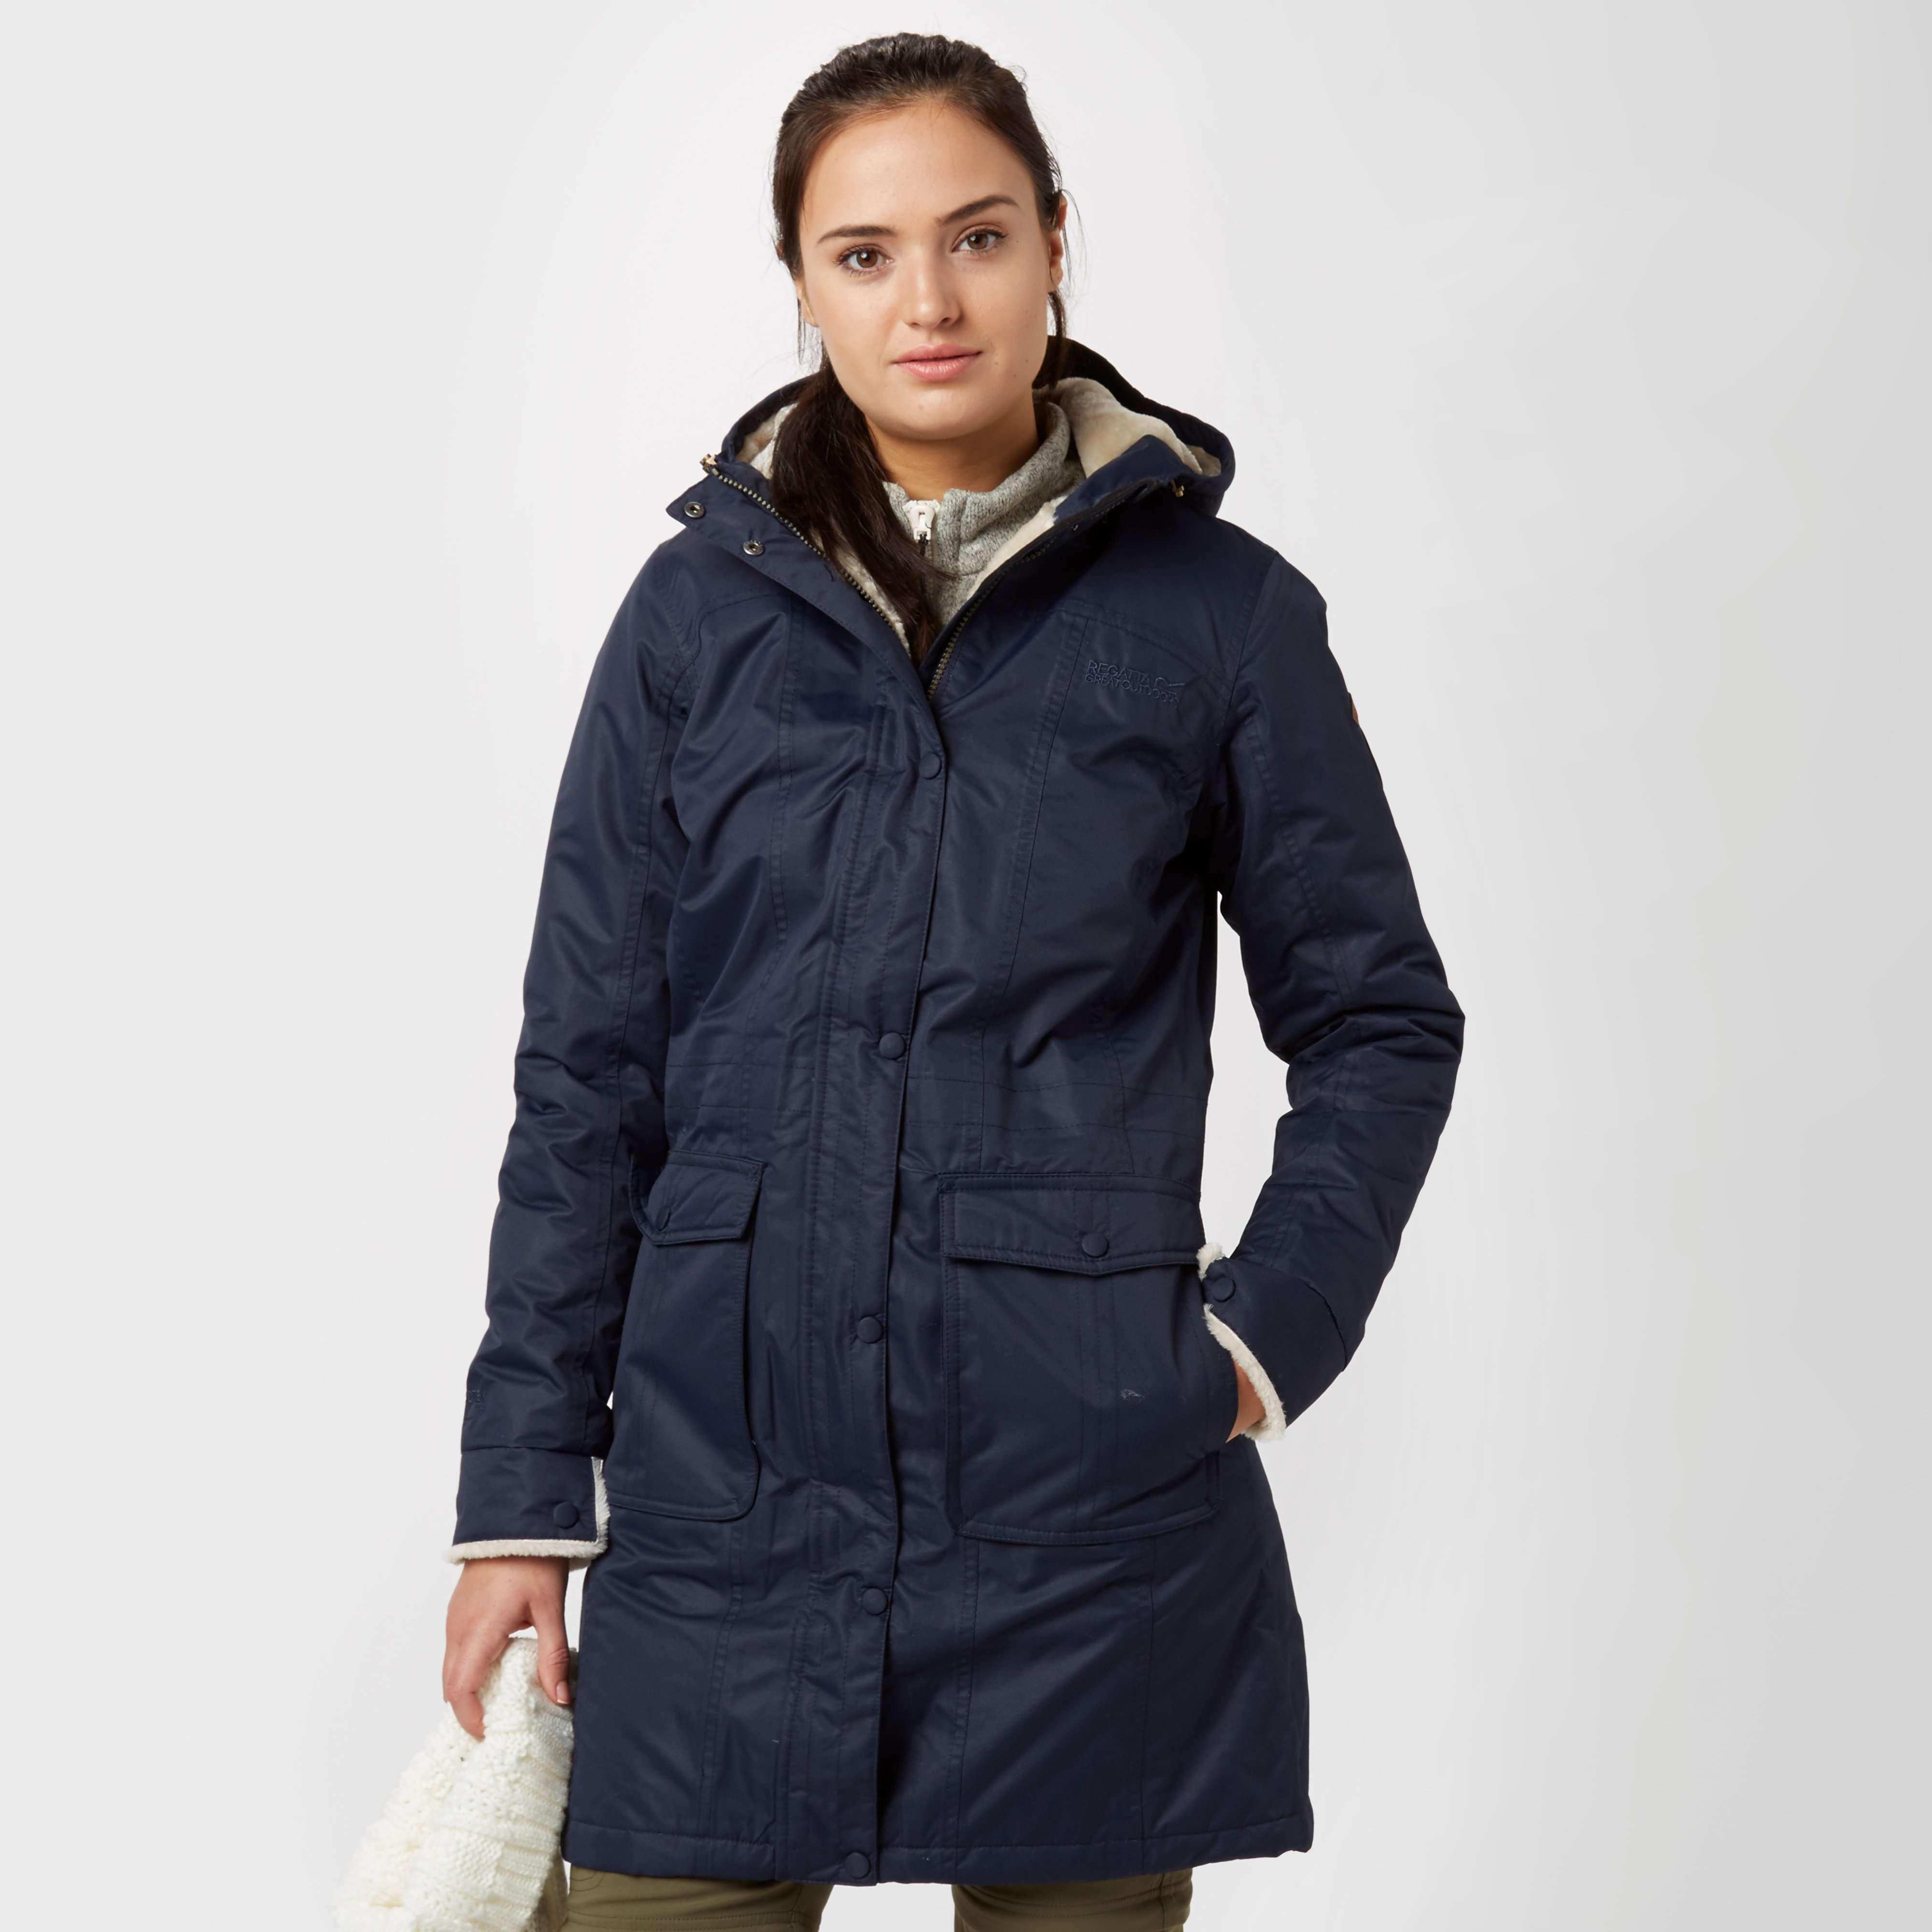 REGATTA Women's Roanstar Jacket